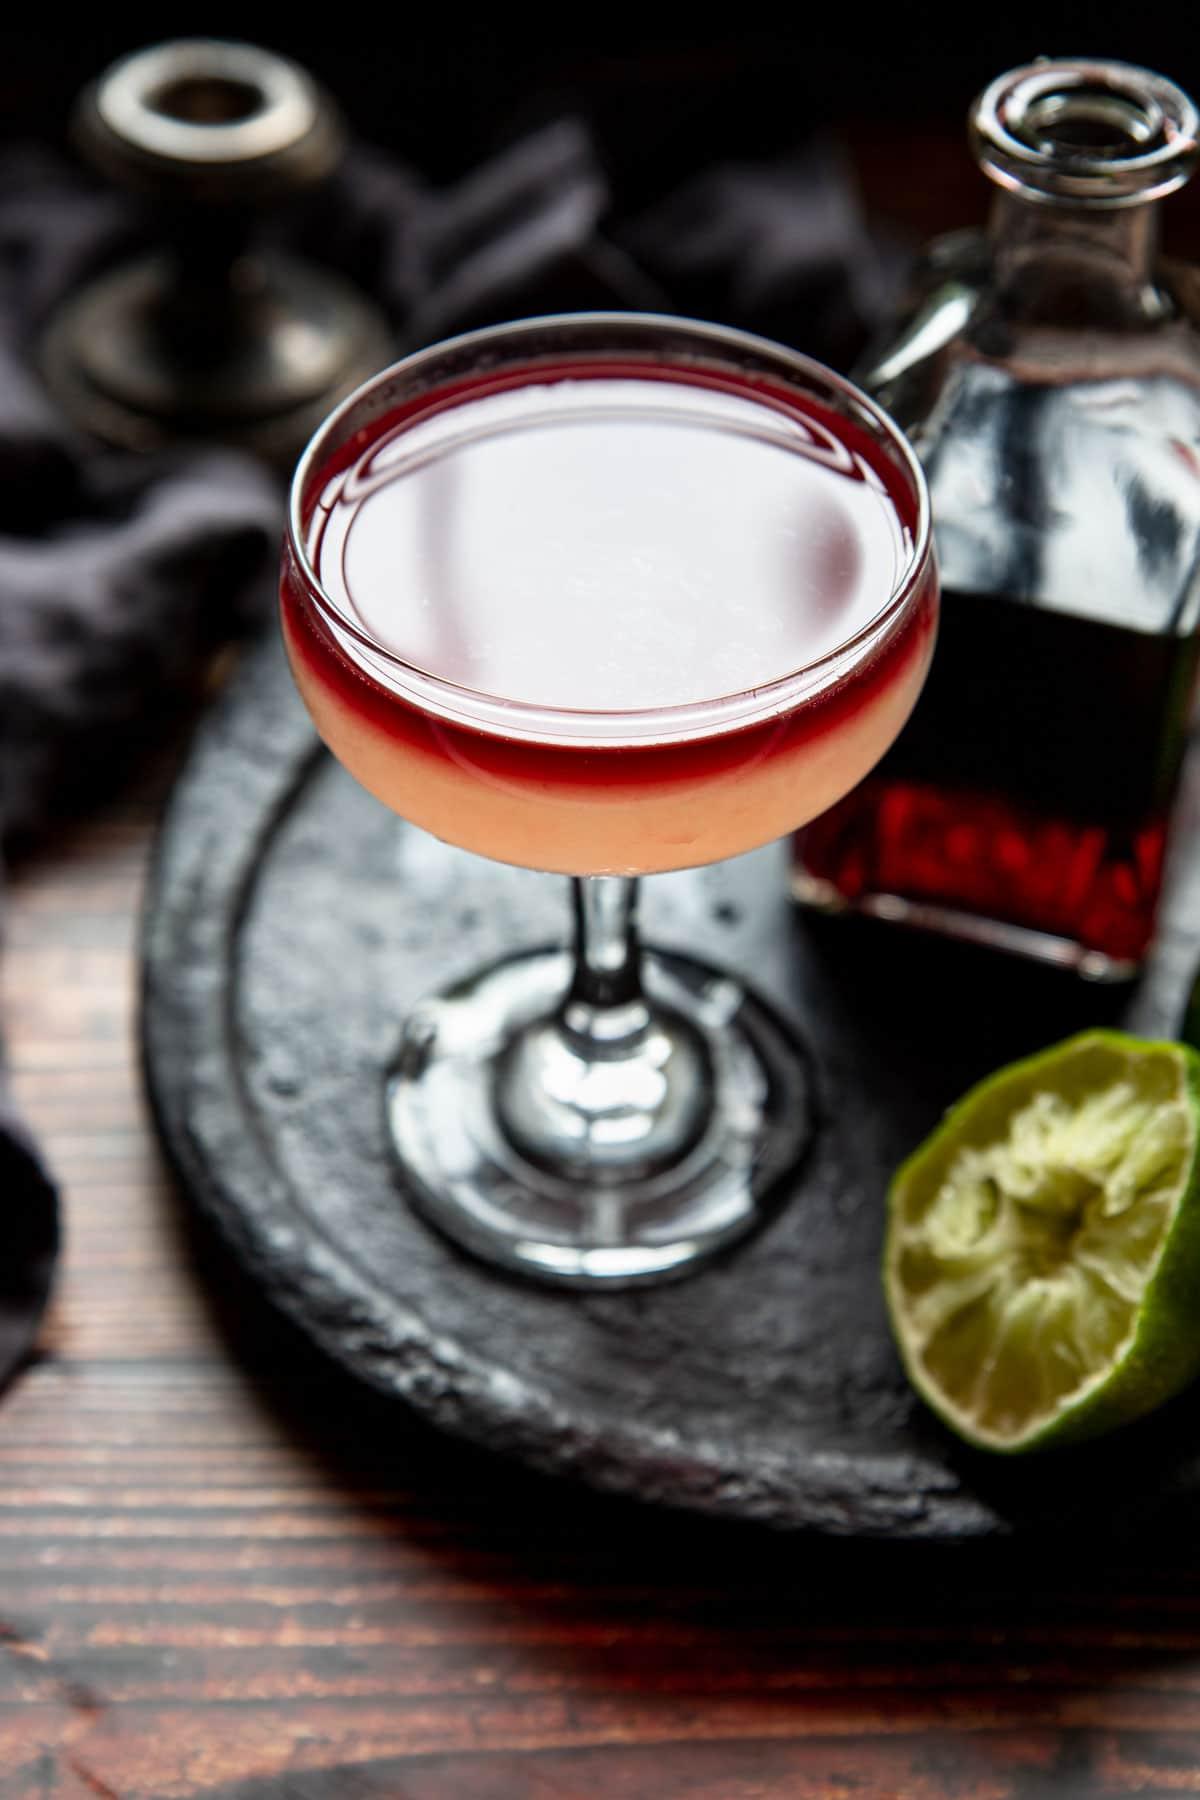 Devil's Margarita in a coupe glass